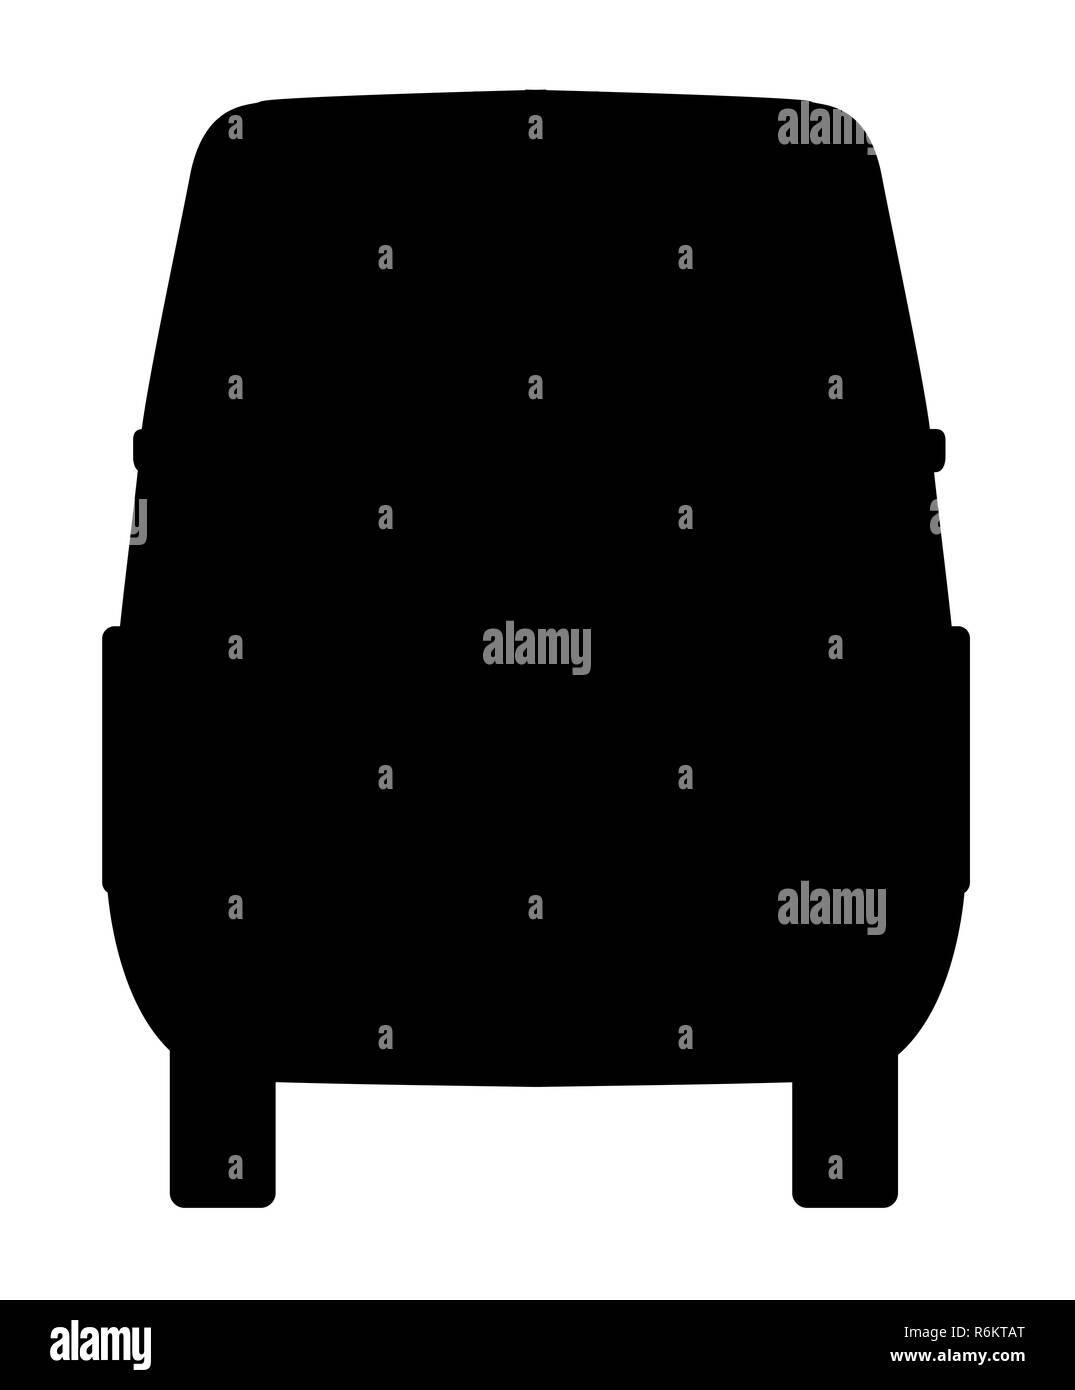 Small Van Rear Silhouette - Stock Image